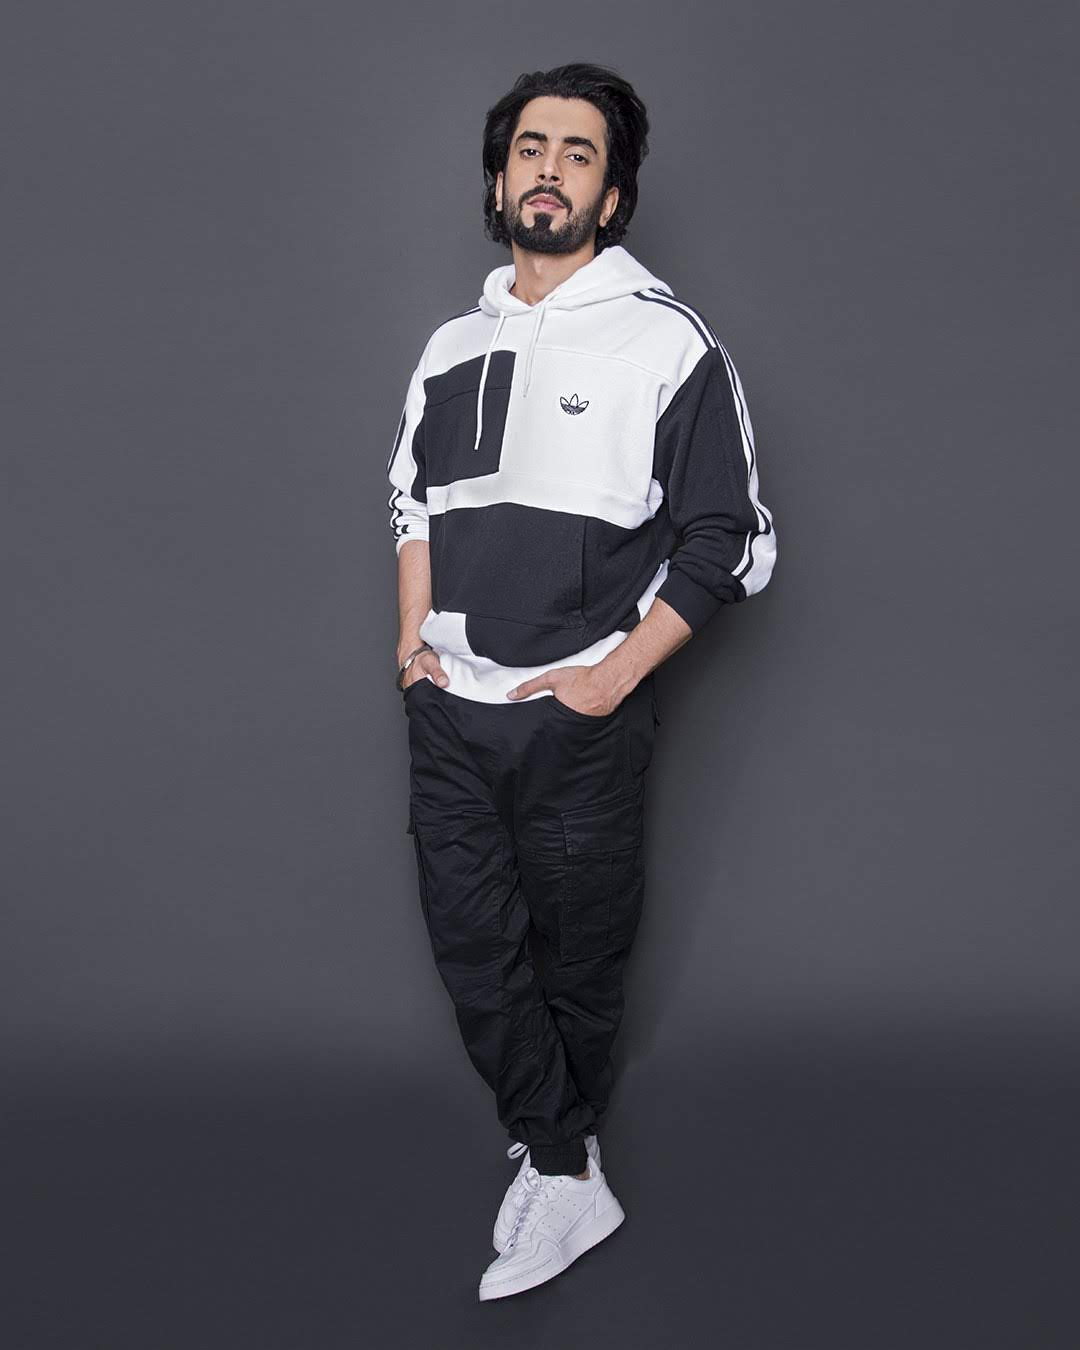 Sunny-Singh-61